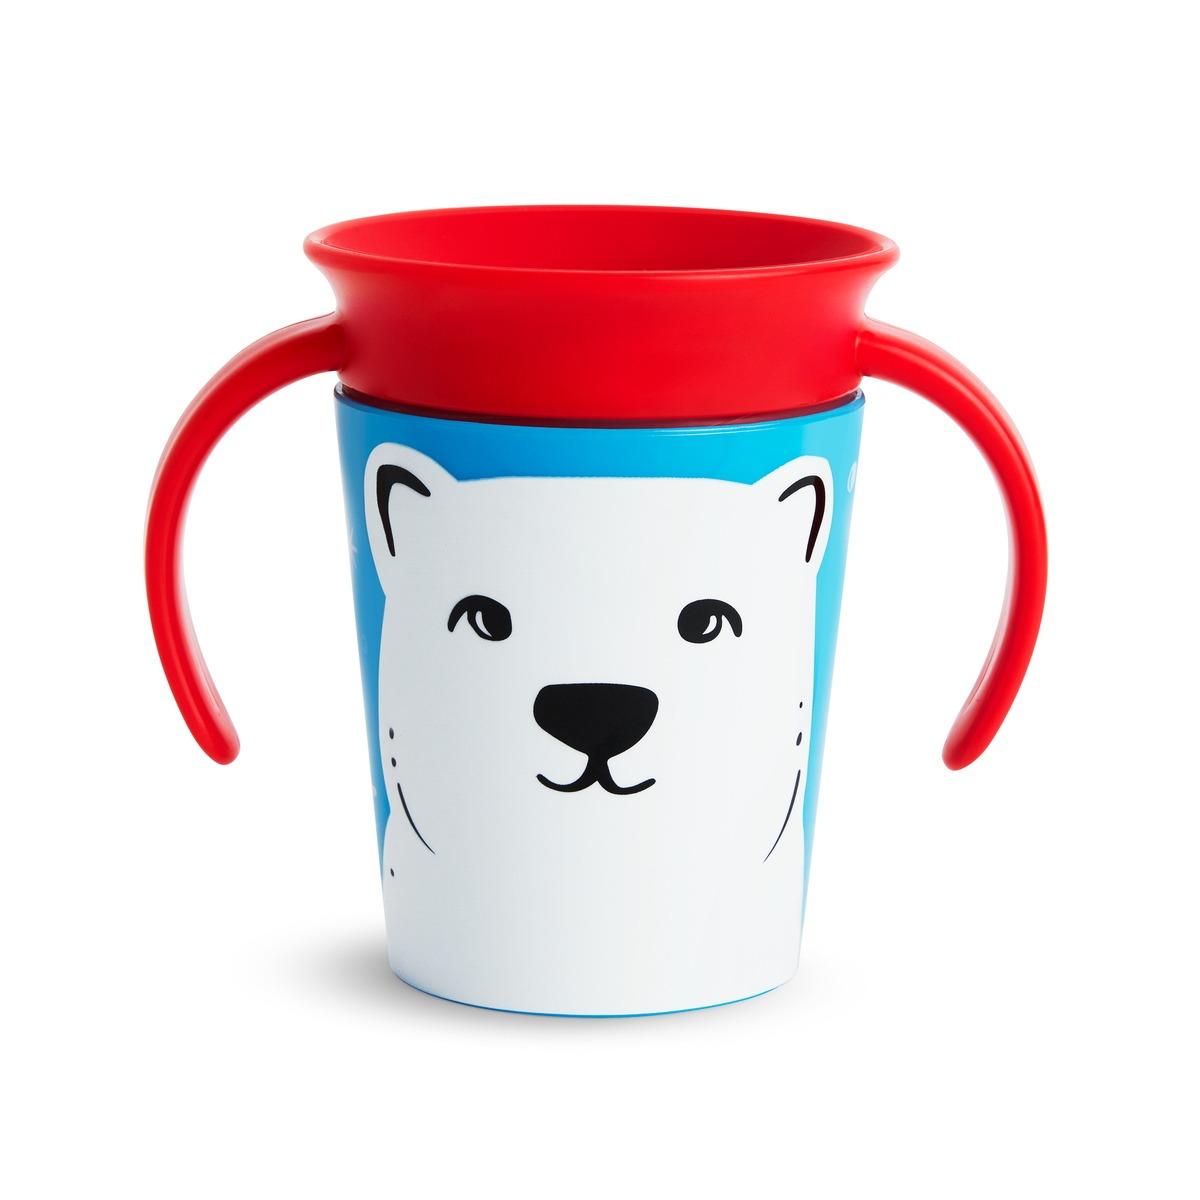 Miracle Trainer Cup 177ml - Munchkin - Polar bear